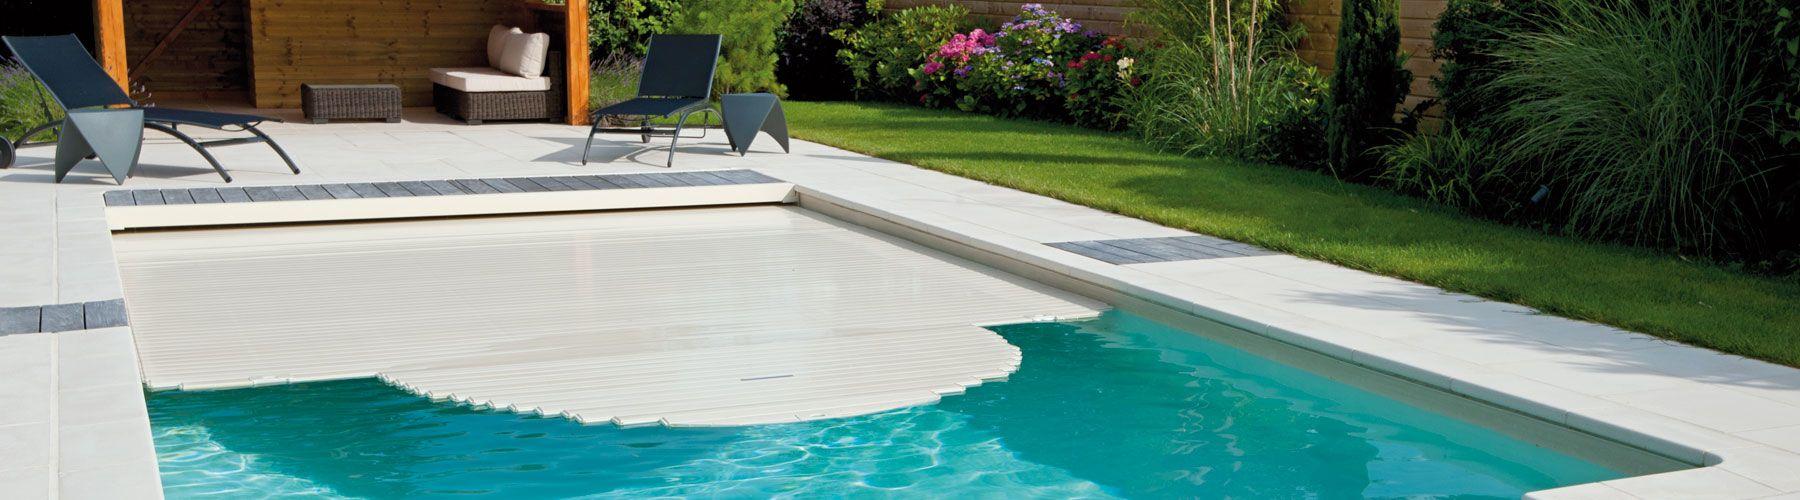 Lona para tapar piscina stunning lonas para piscinas for Lona termica piscina